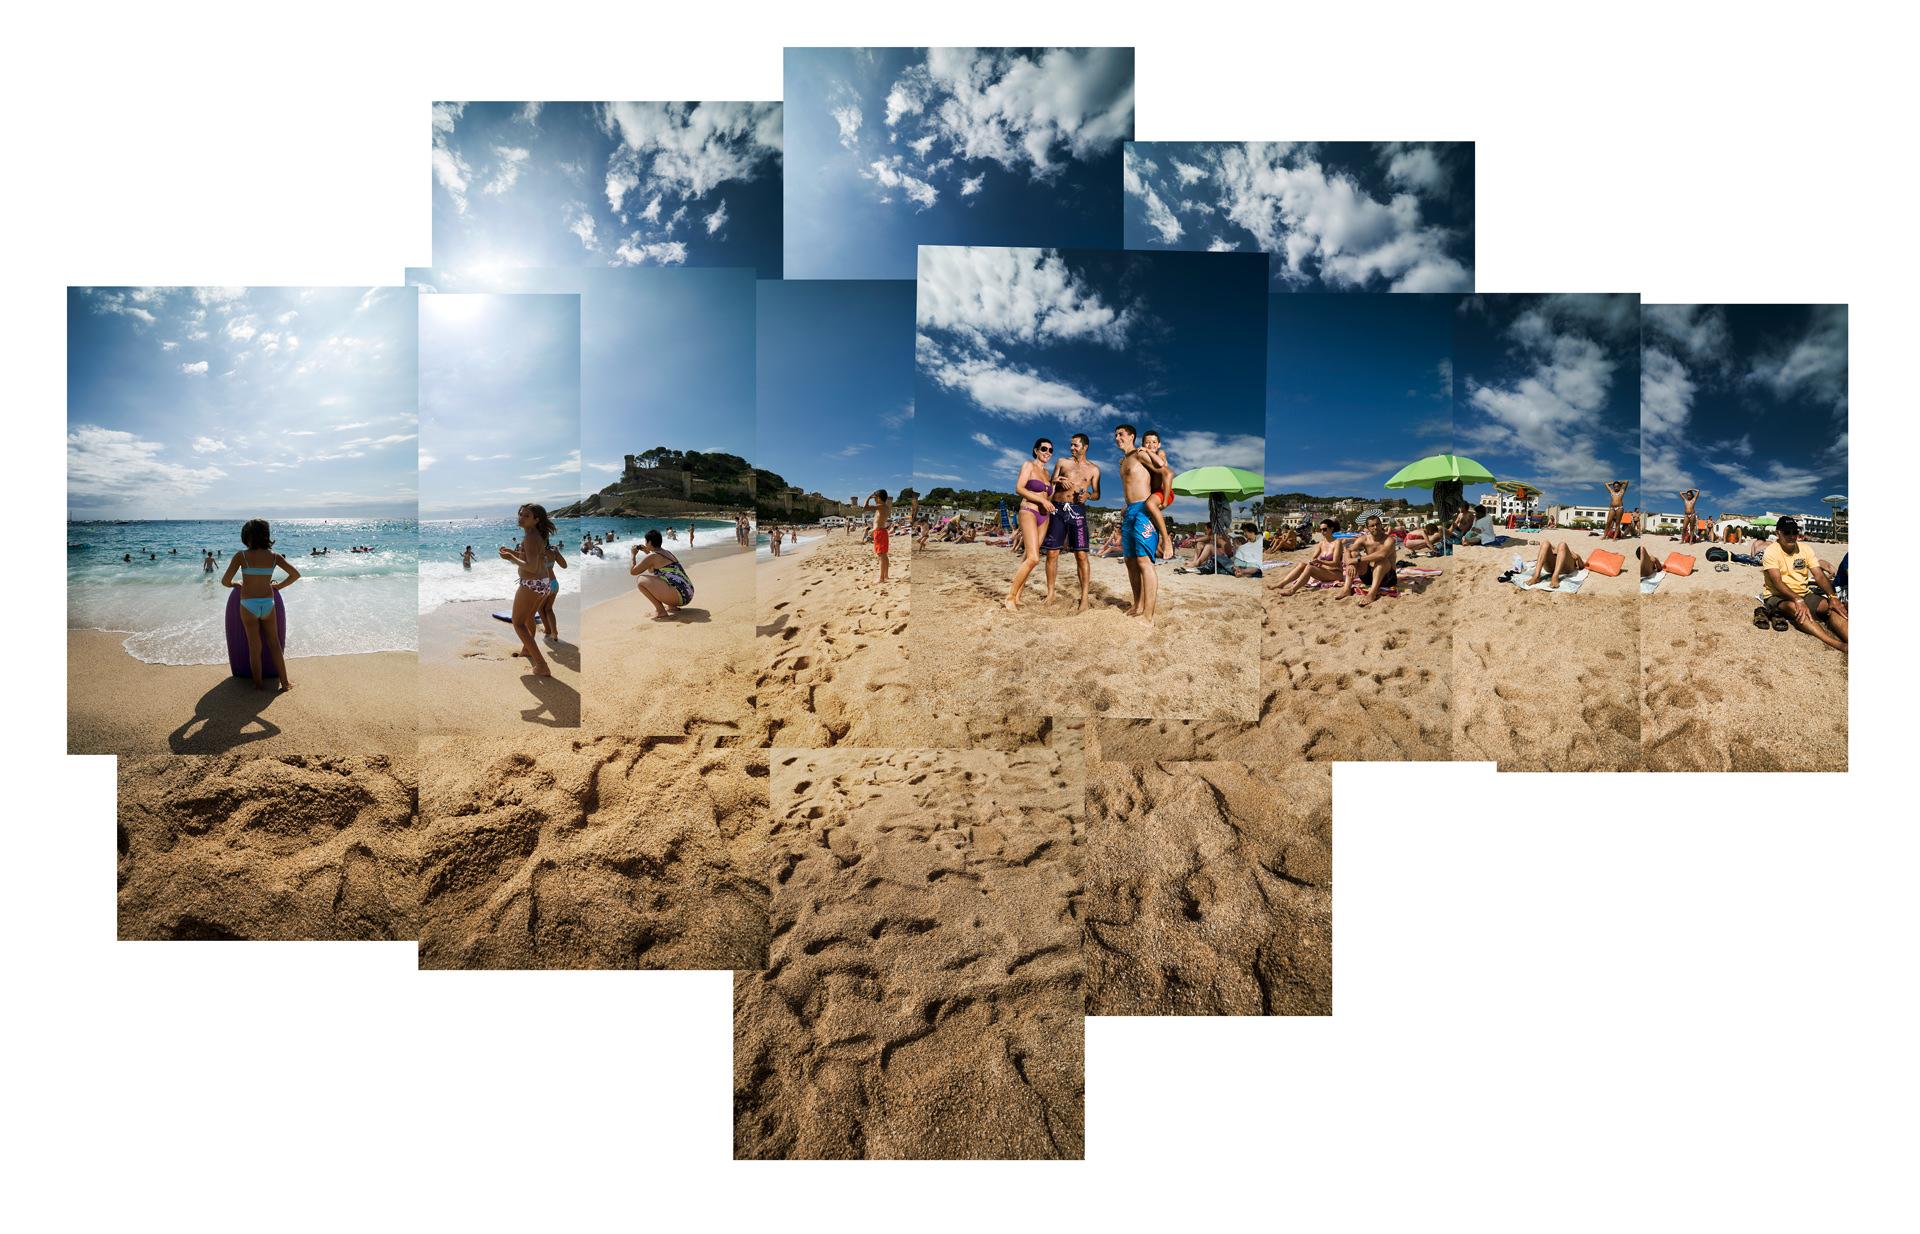 ©ankeluckmann647, ADAC, Reisemagazin, beach, spain, costa brava, people, landscape